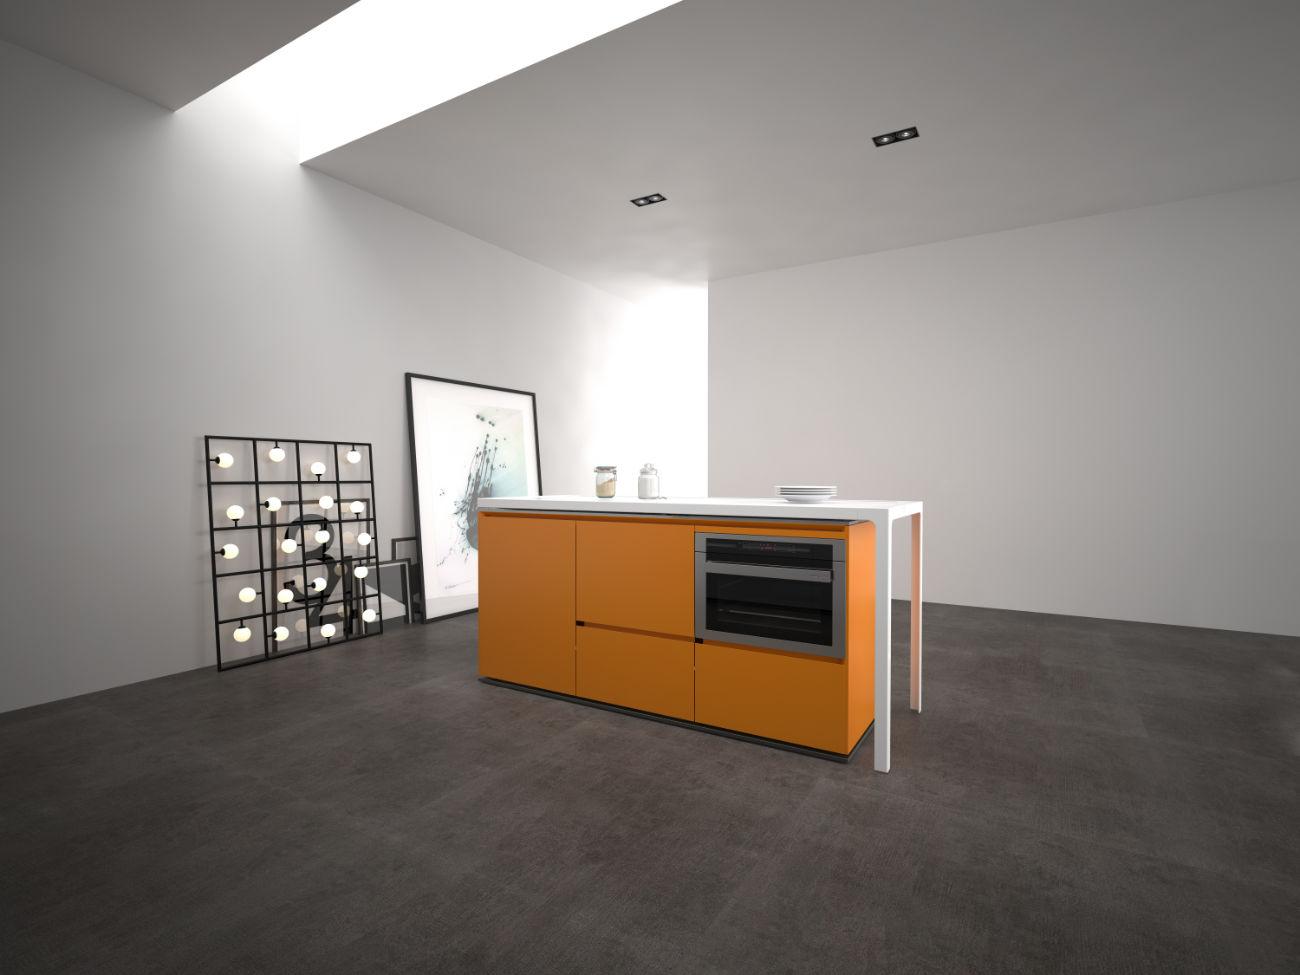 04G_Estel_Le case Italiane_Day_Cucina Wiwa__Isole Compact_Indoor